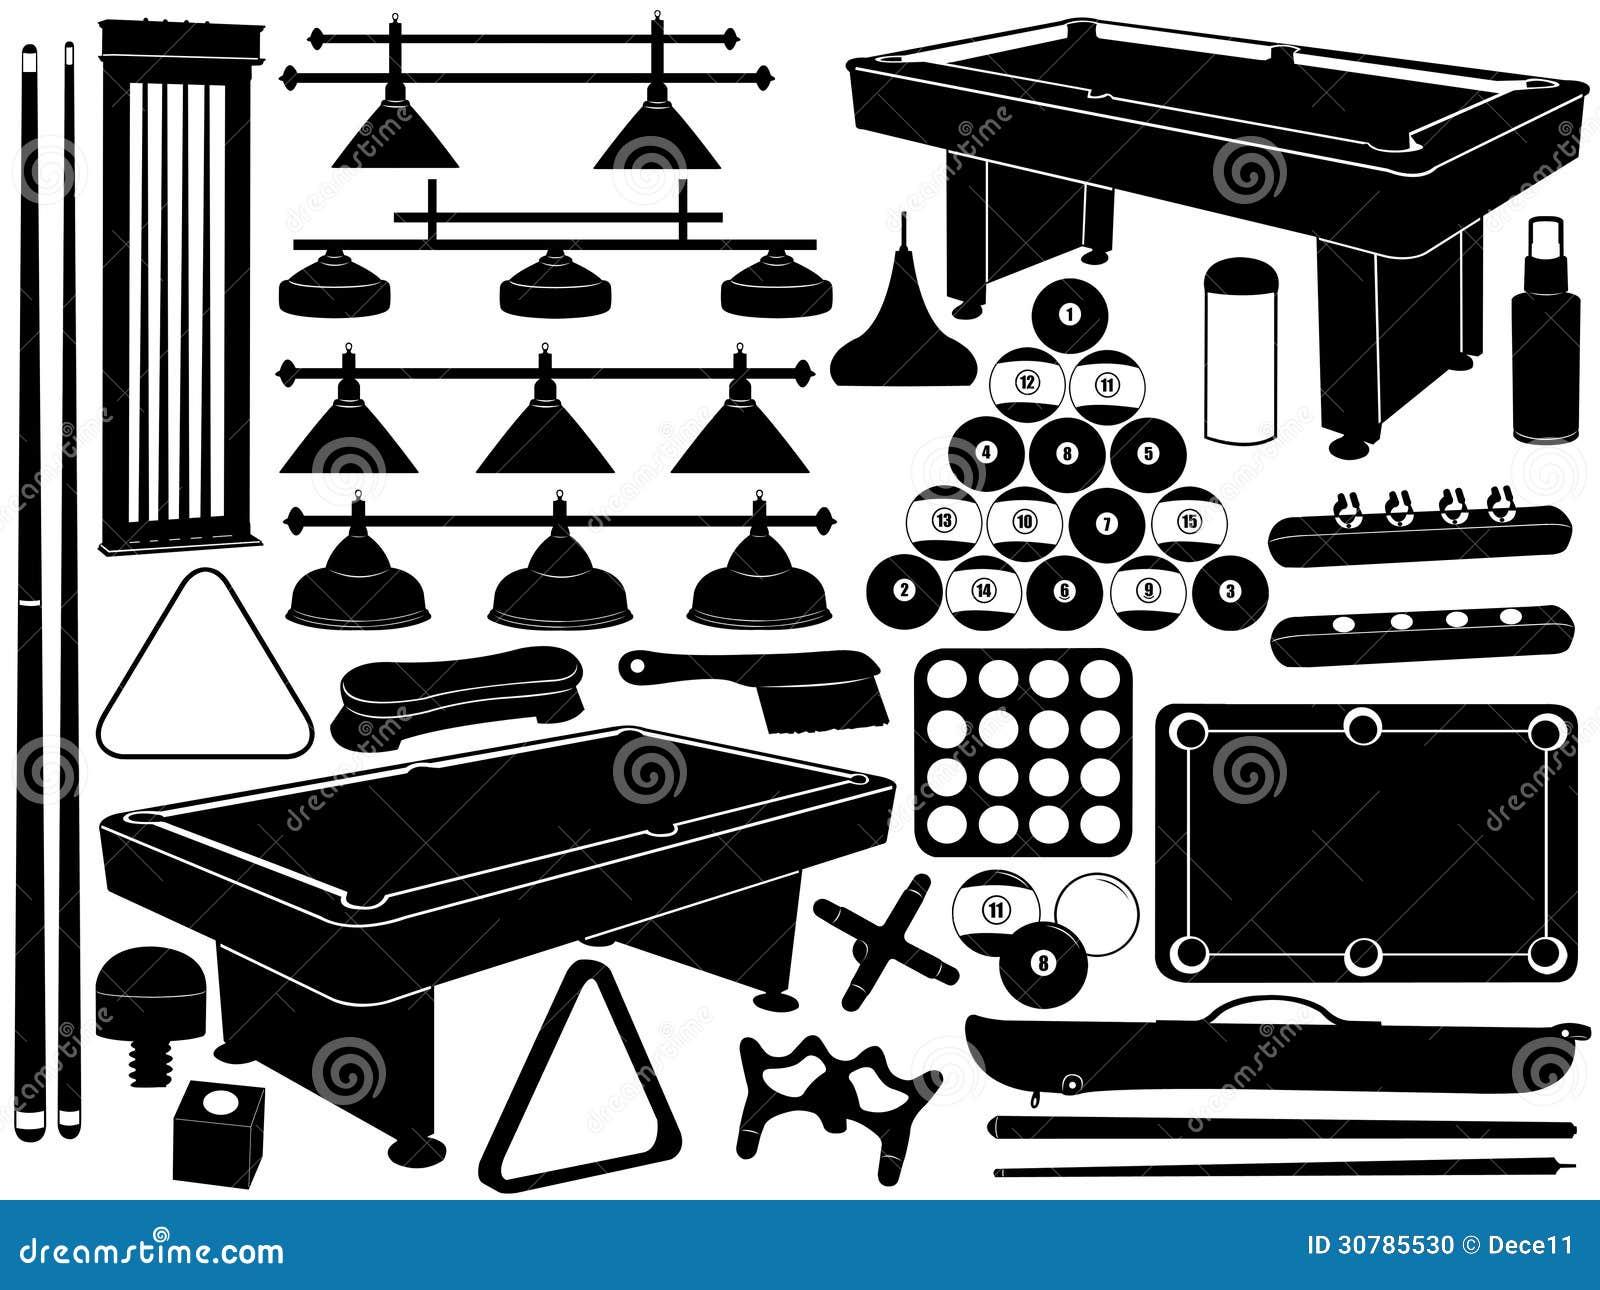 Illustration Of Pool Equipment